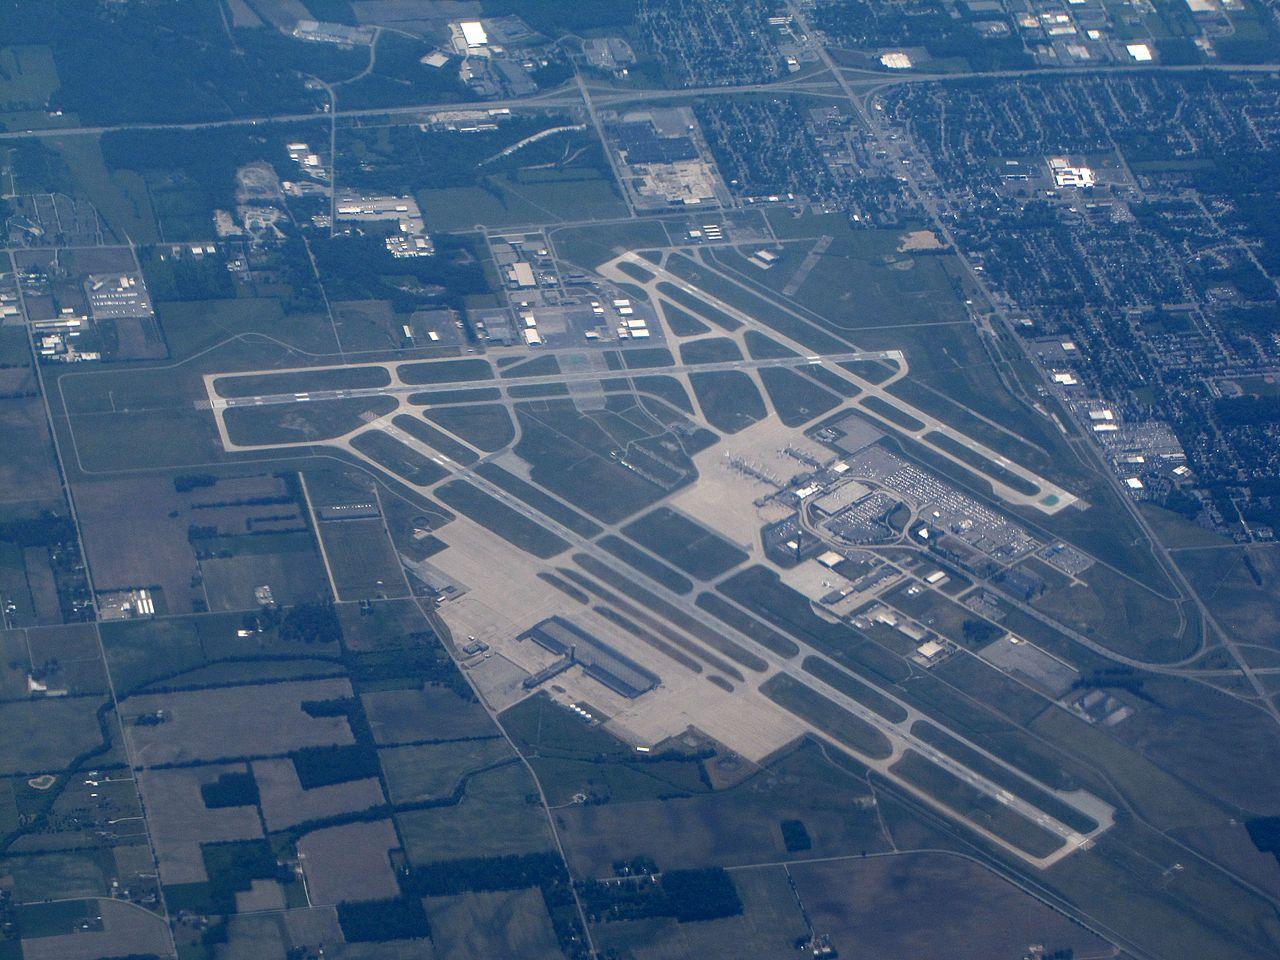 1280px-James_M._Cox_Dayton_International_Airport_%287174690393%29.jpg